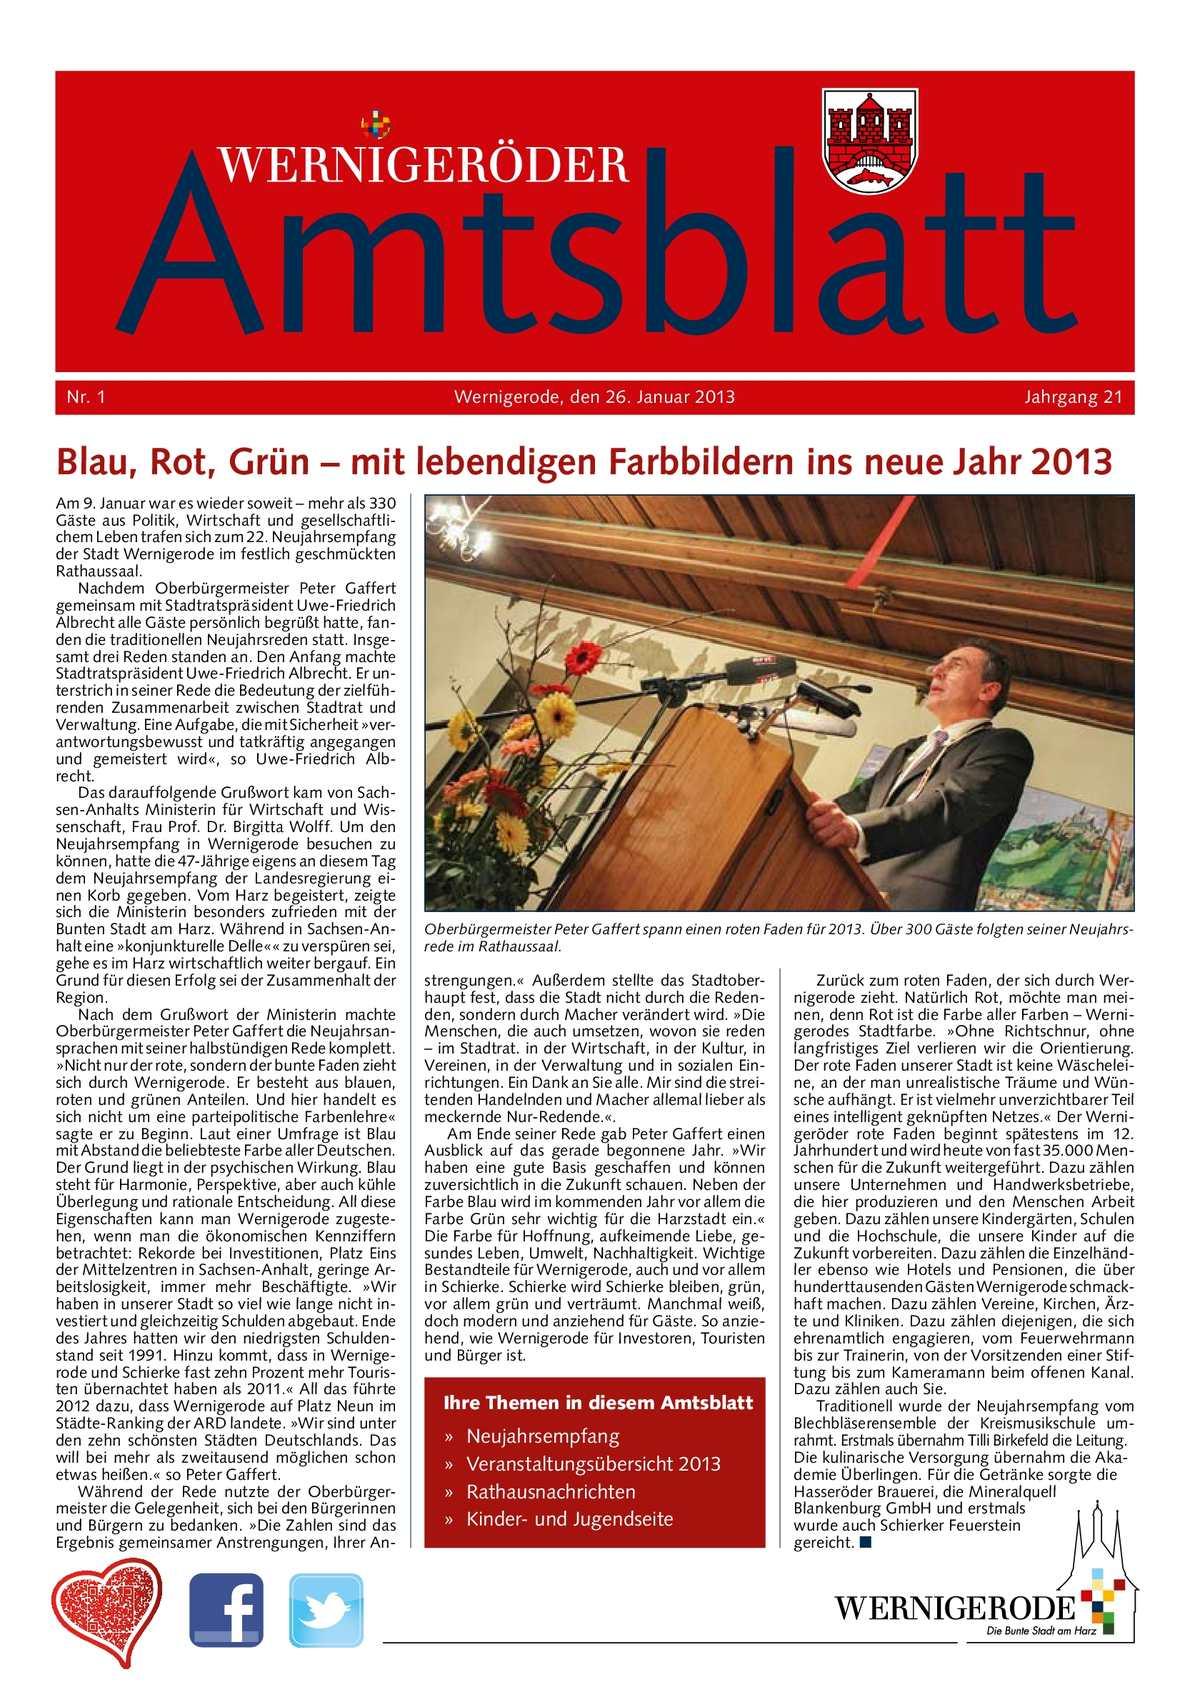 Calaméo - Amtsblatt der Stadt Wernigerode - Ausgabe 1 / 2013